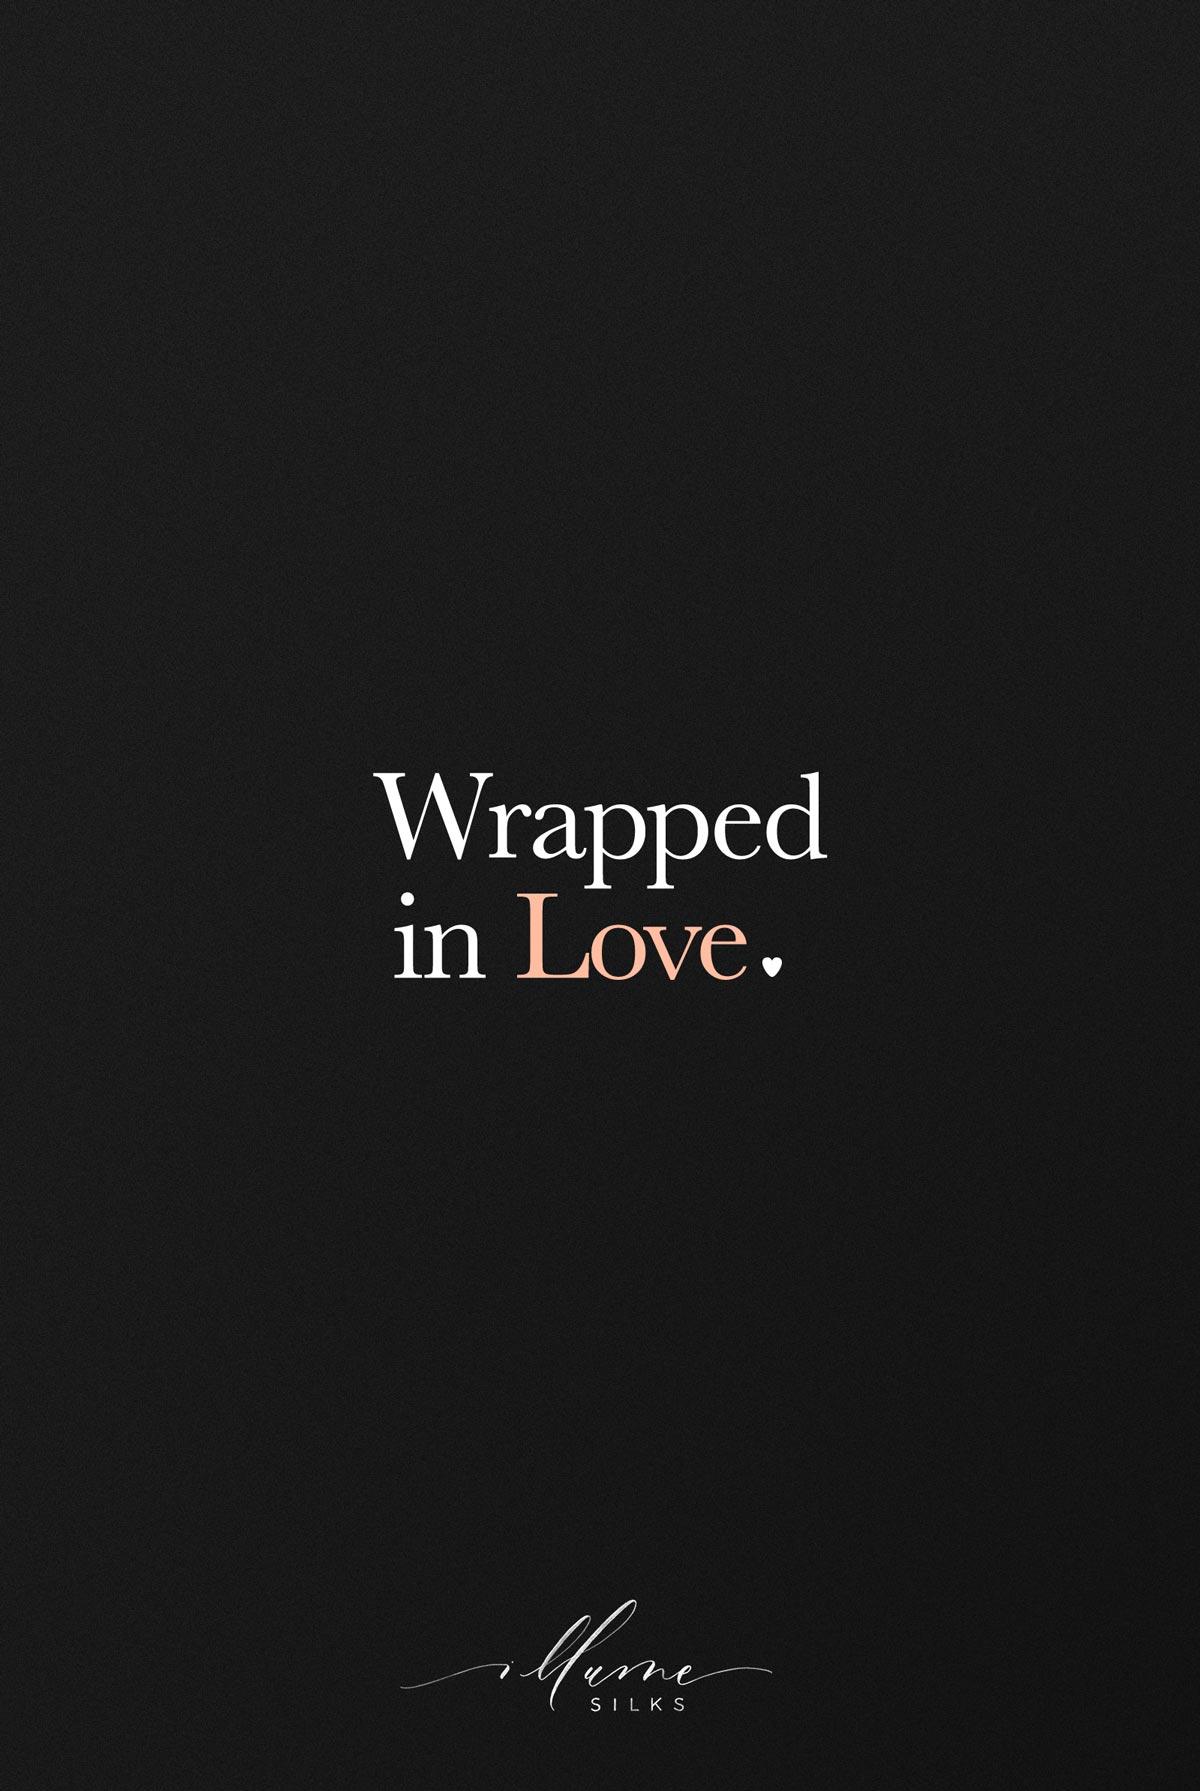 illume silks wrapped in love